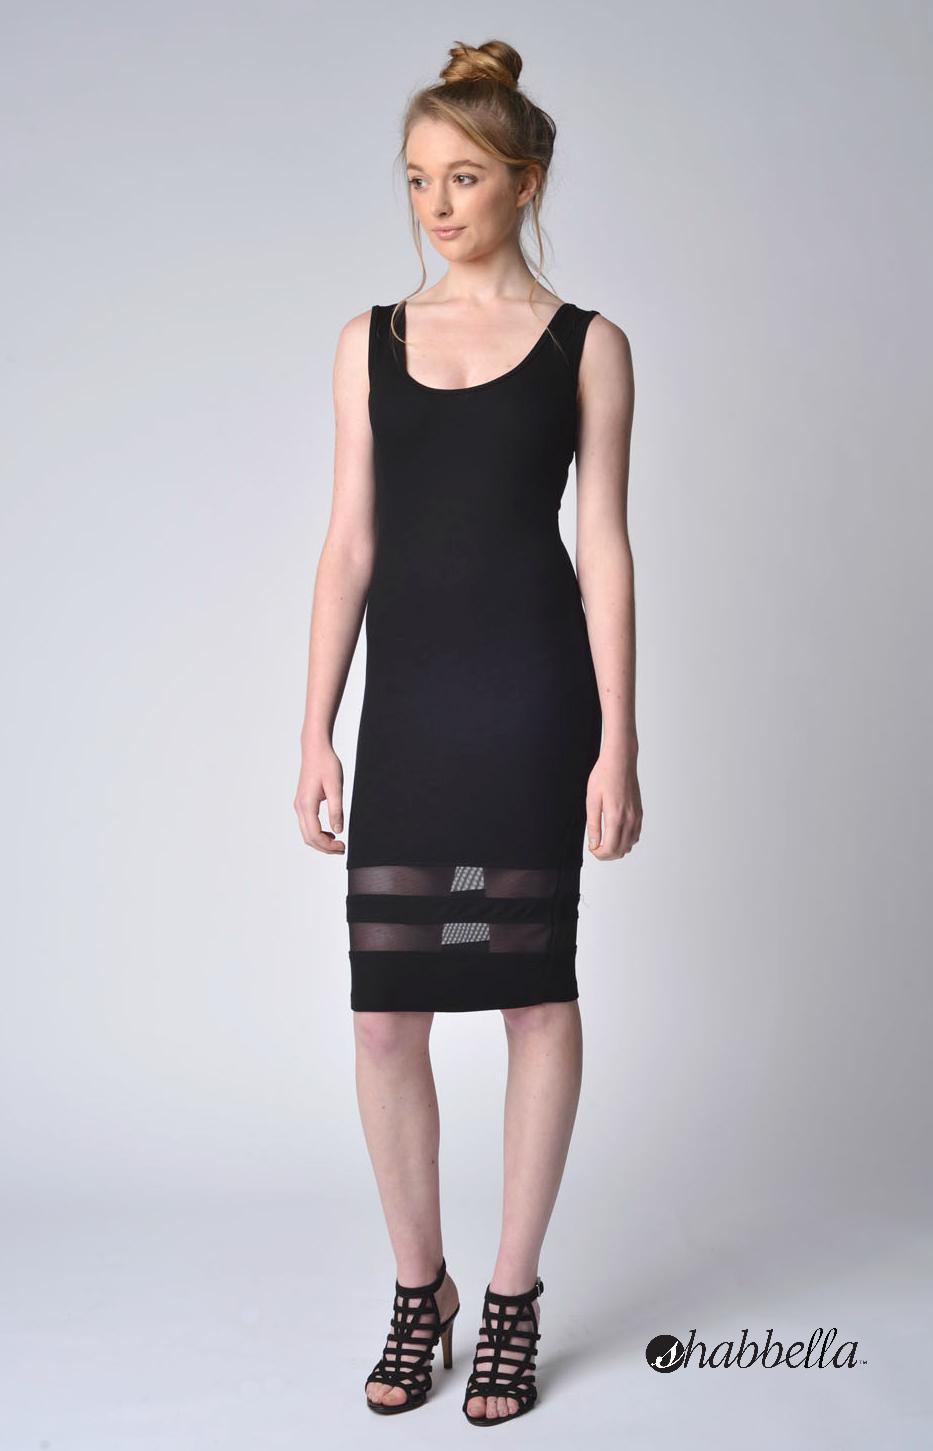 Little black sporty dress shabbella